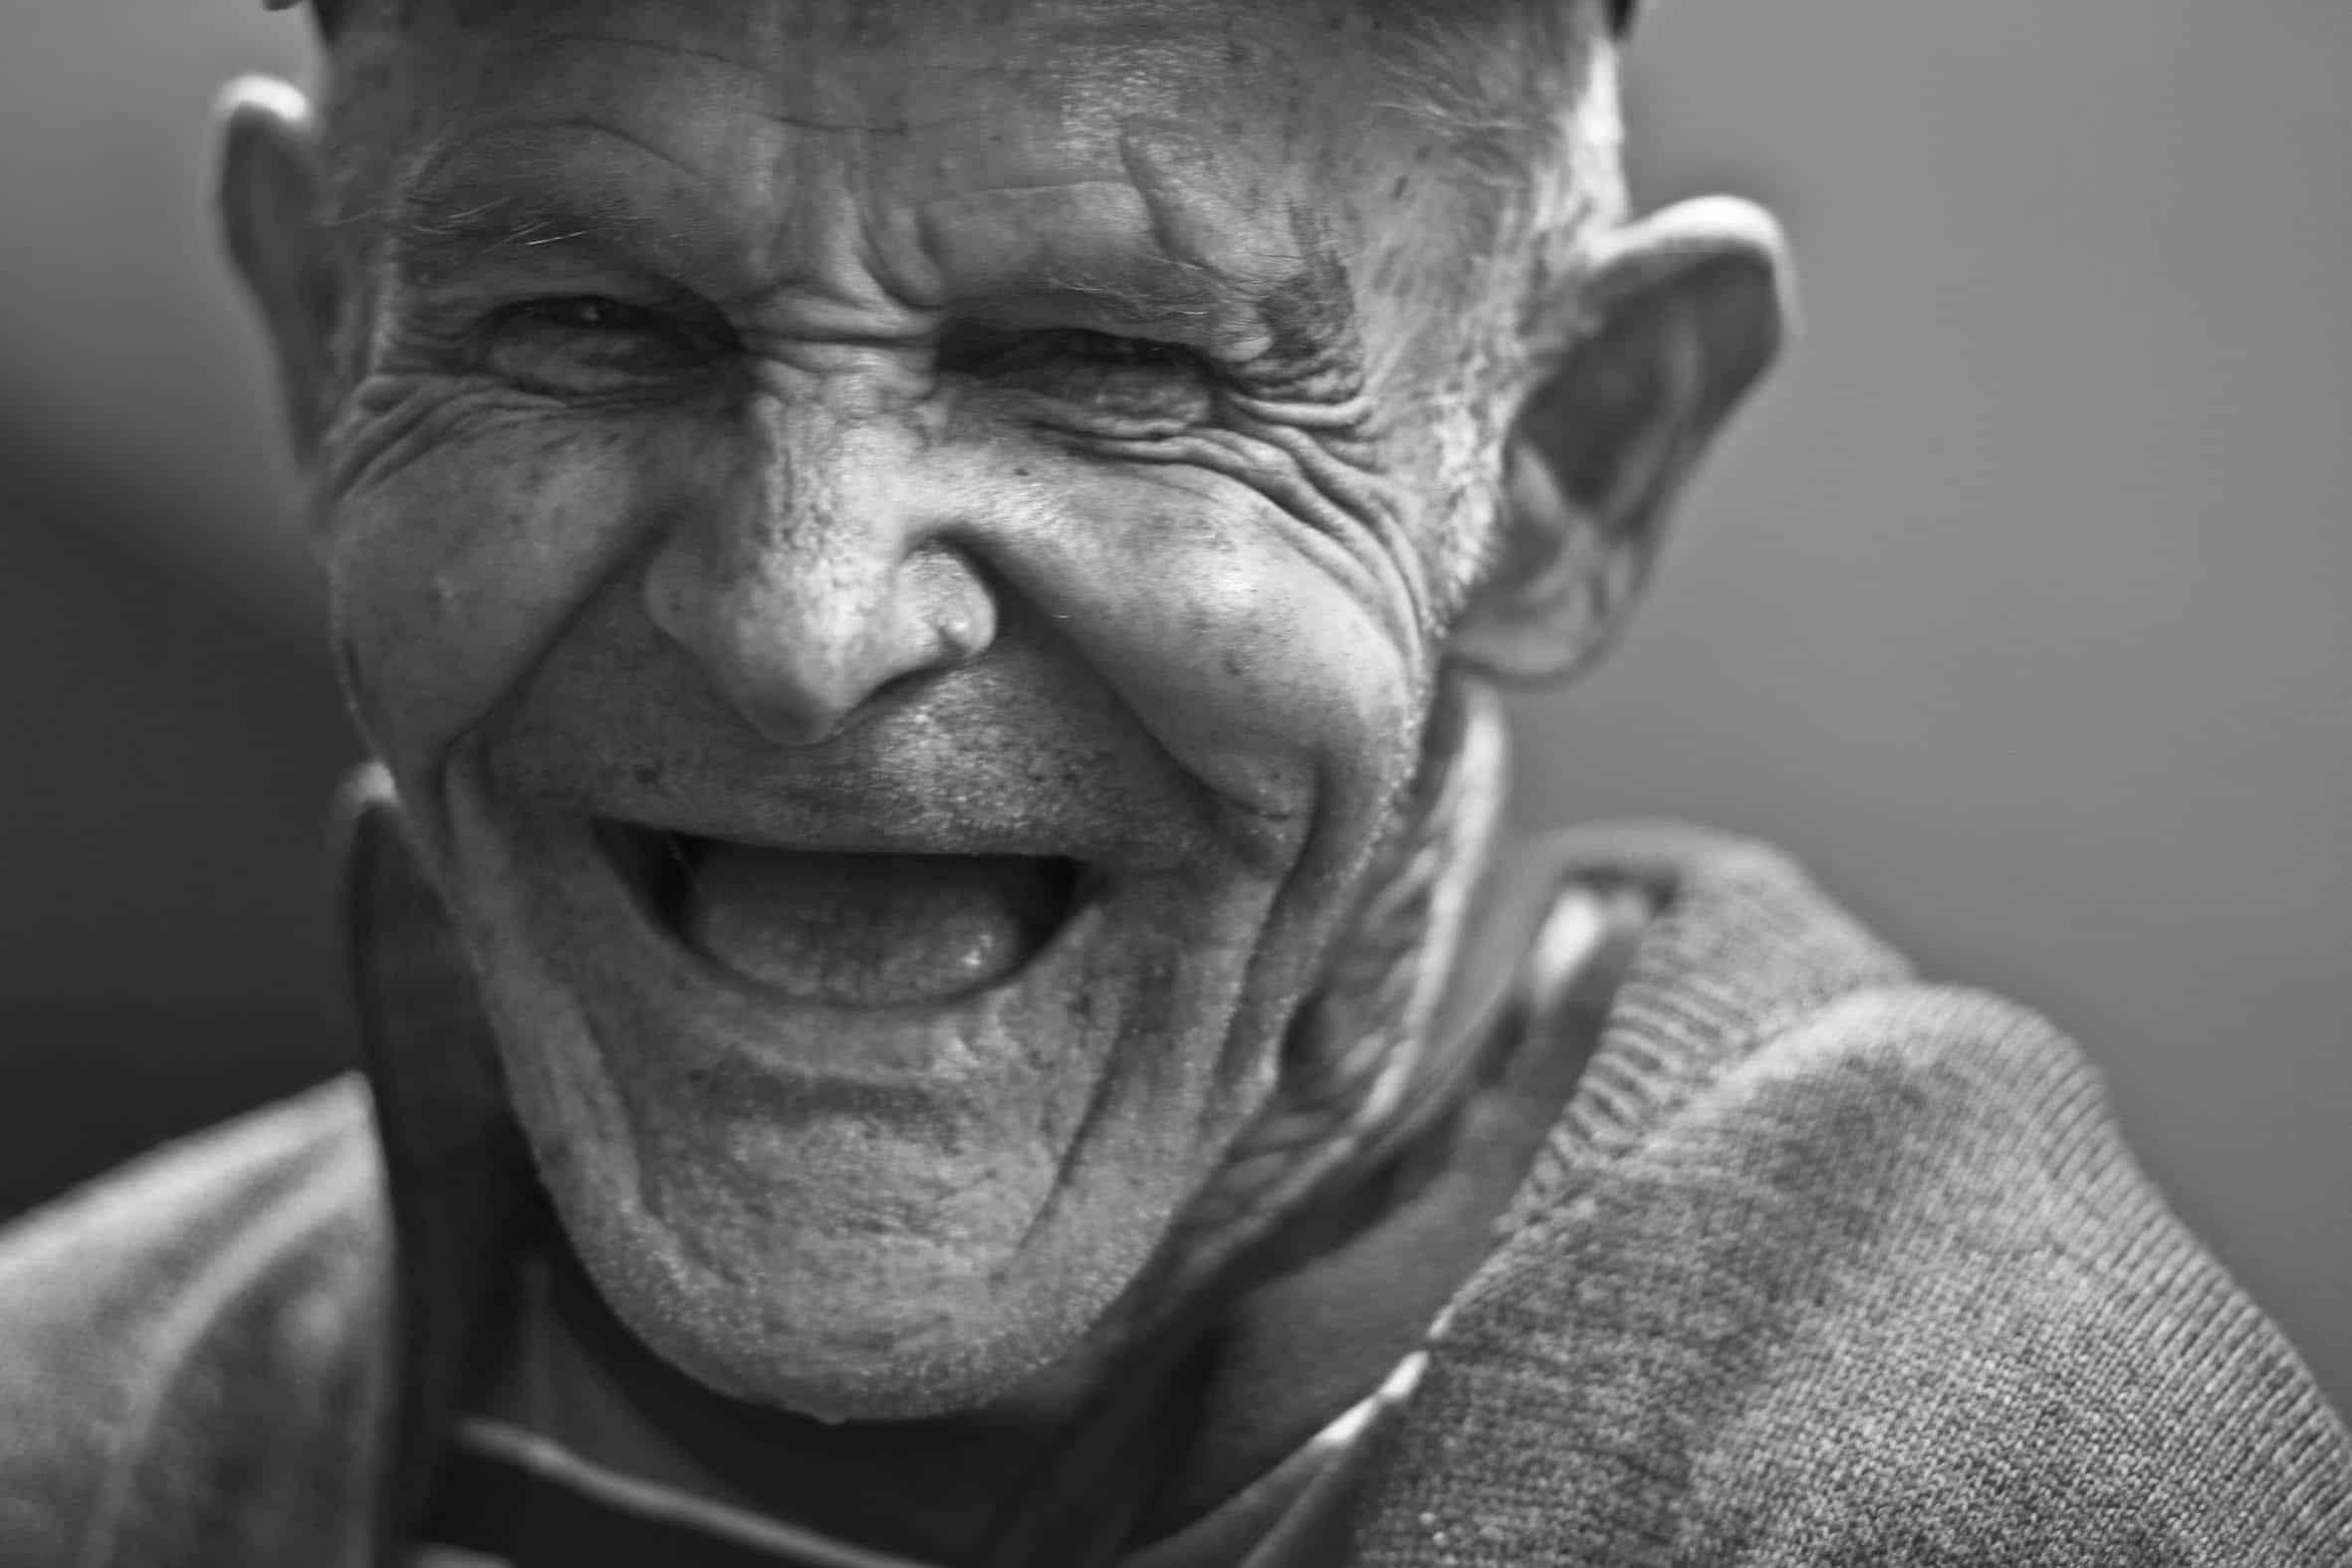 Oude man lachen zonder tanden | Event Inspiration Agency